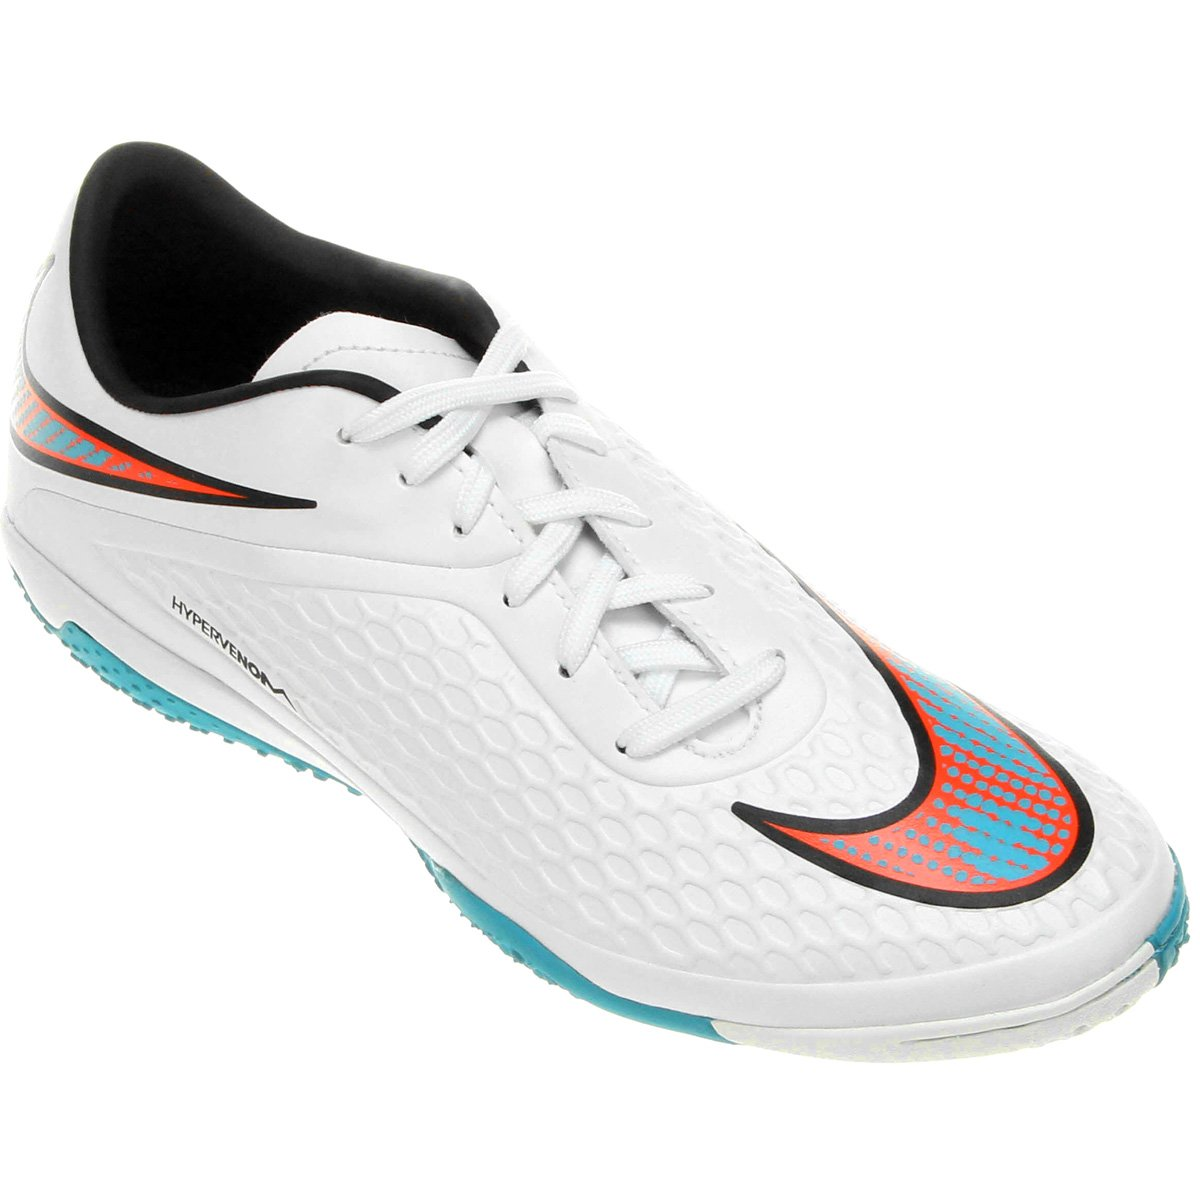 a441944212da6 Chuteira Nike Hypervenom Phelon IC | Netshoes